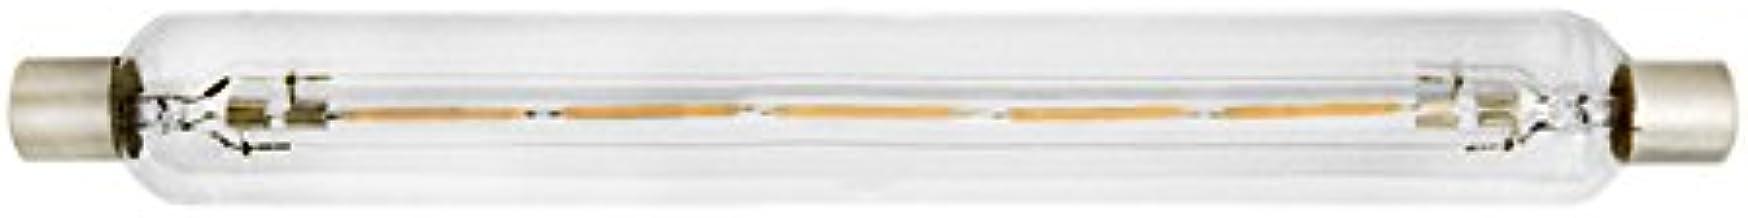 Laes 985887 Soffito Claro LED-lamp S19, 4 W, 36 x 310 mm